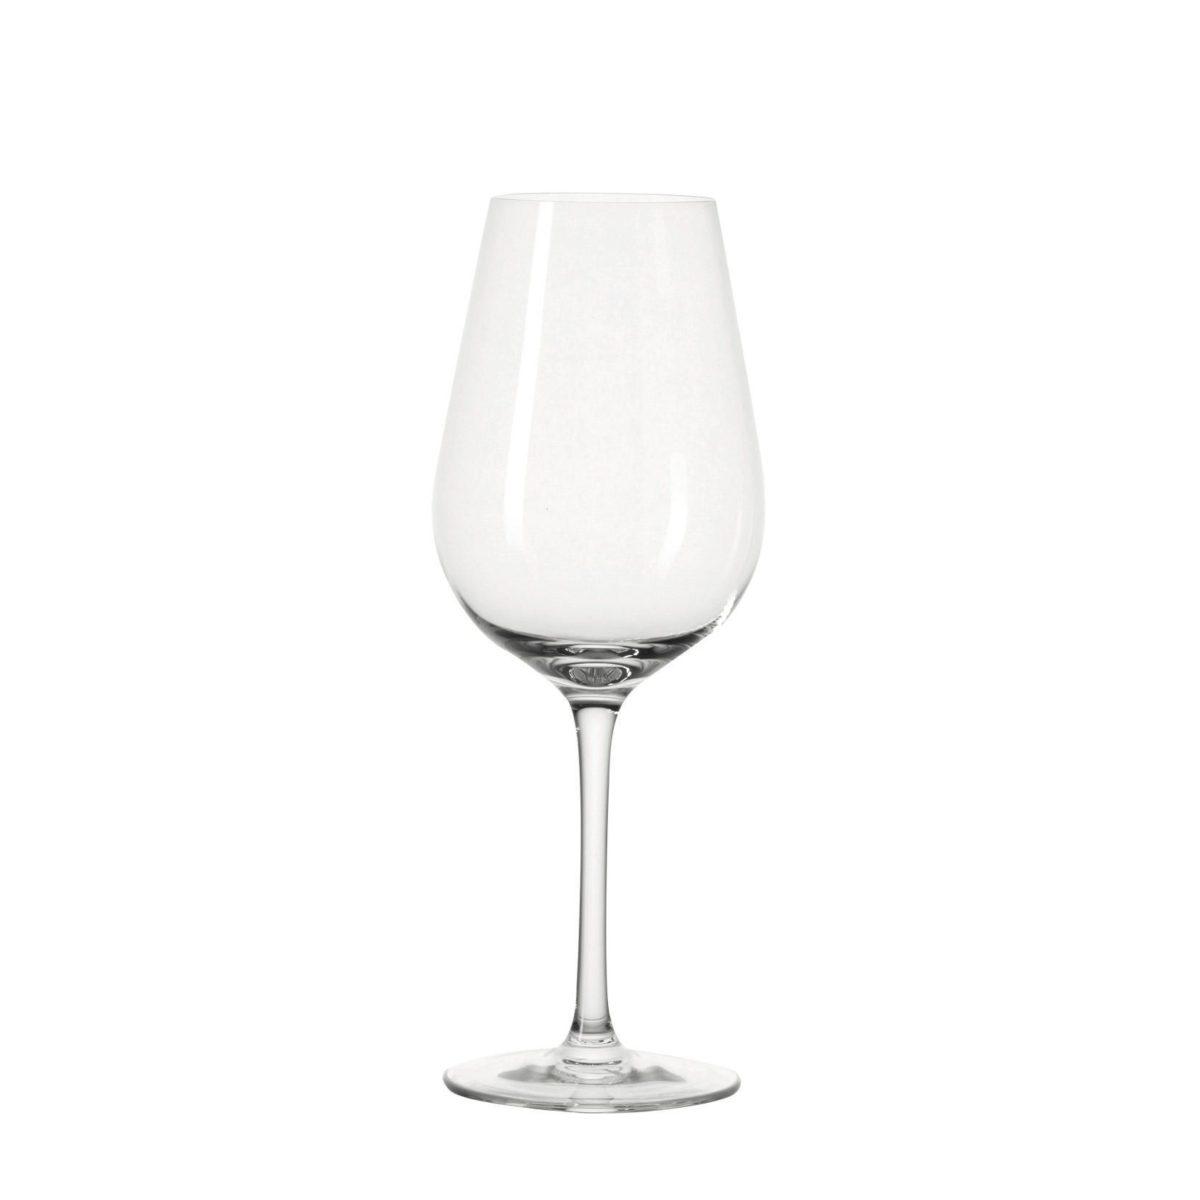 Leonardo Rotweinglas Tivoli 580ml N 003.xxl3  1200x1200 - Pahar pentru vin roșu Tivoli 580 ml (L020964)